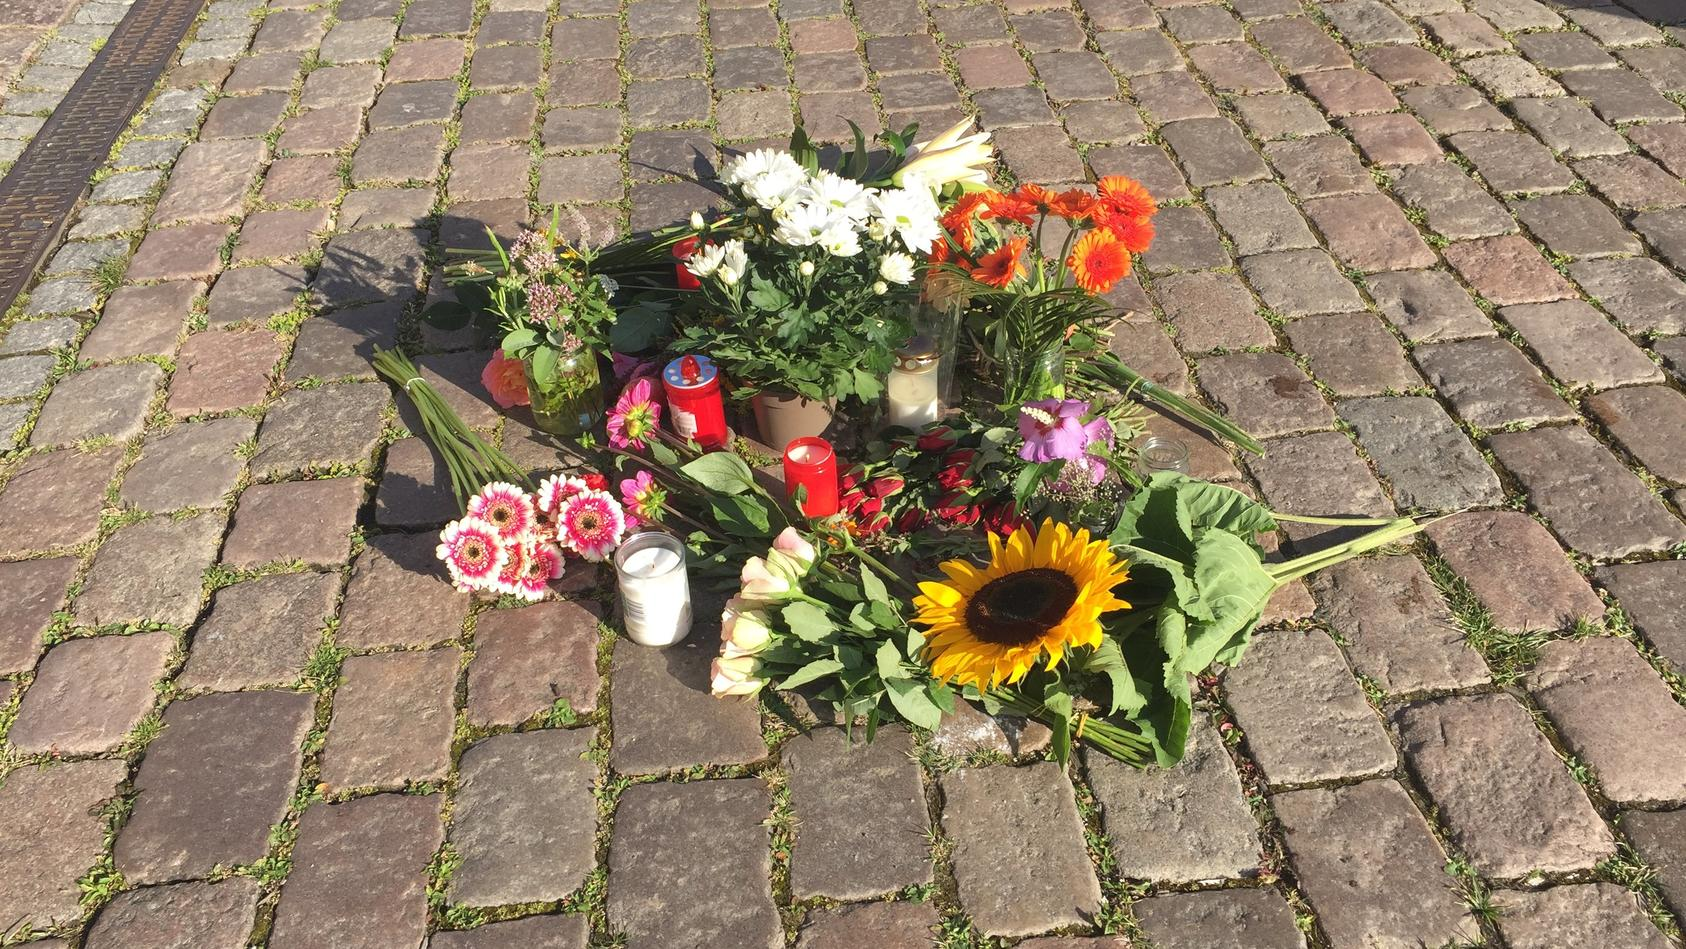 Blumen liegen am Unfallort